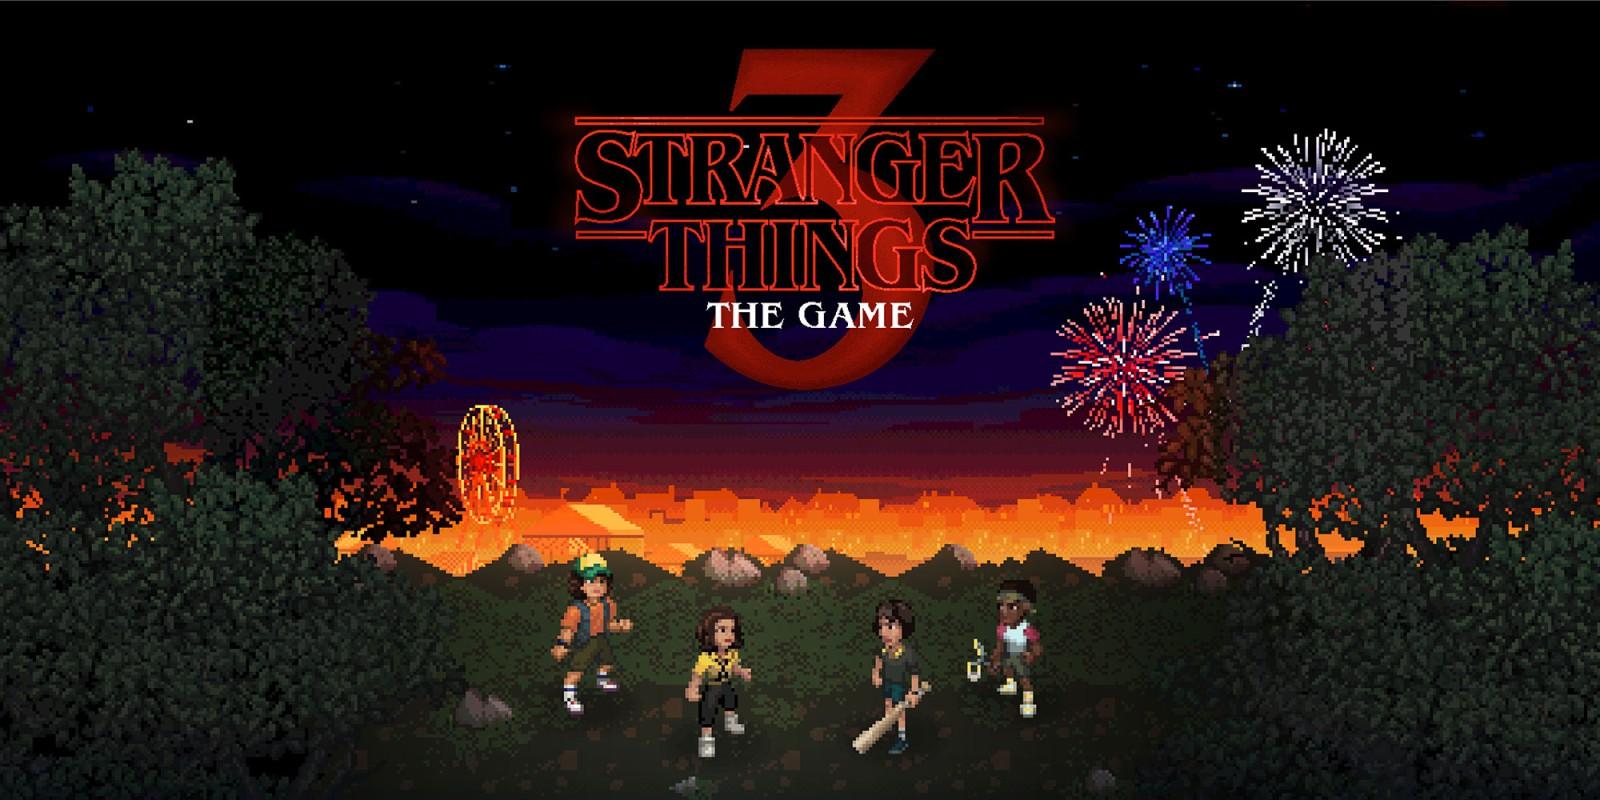 Stranger Things 3 The Game, Netflix